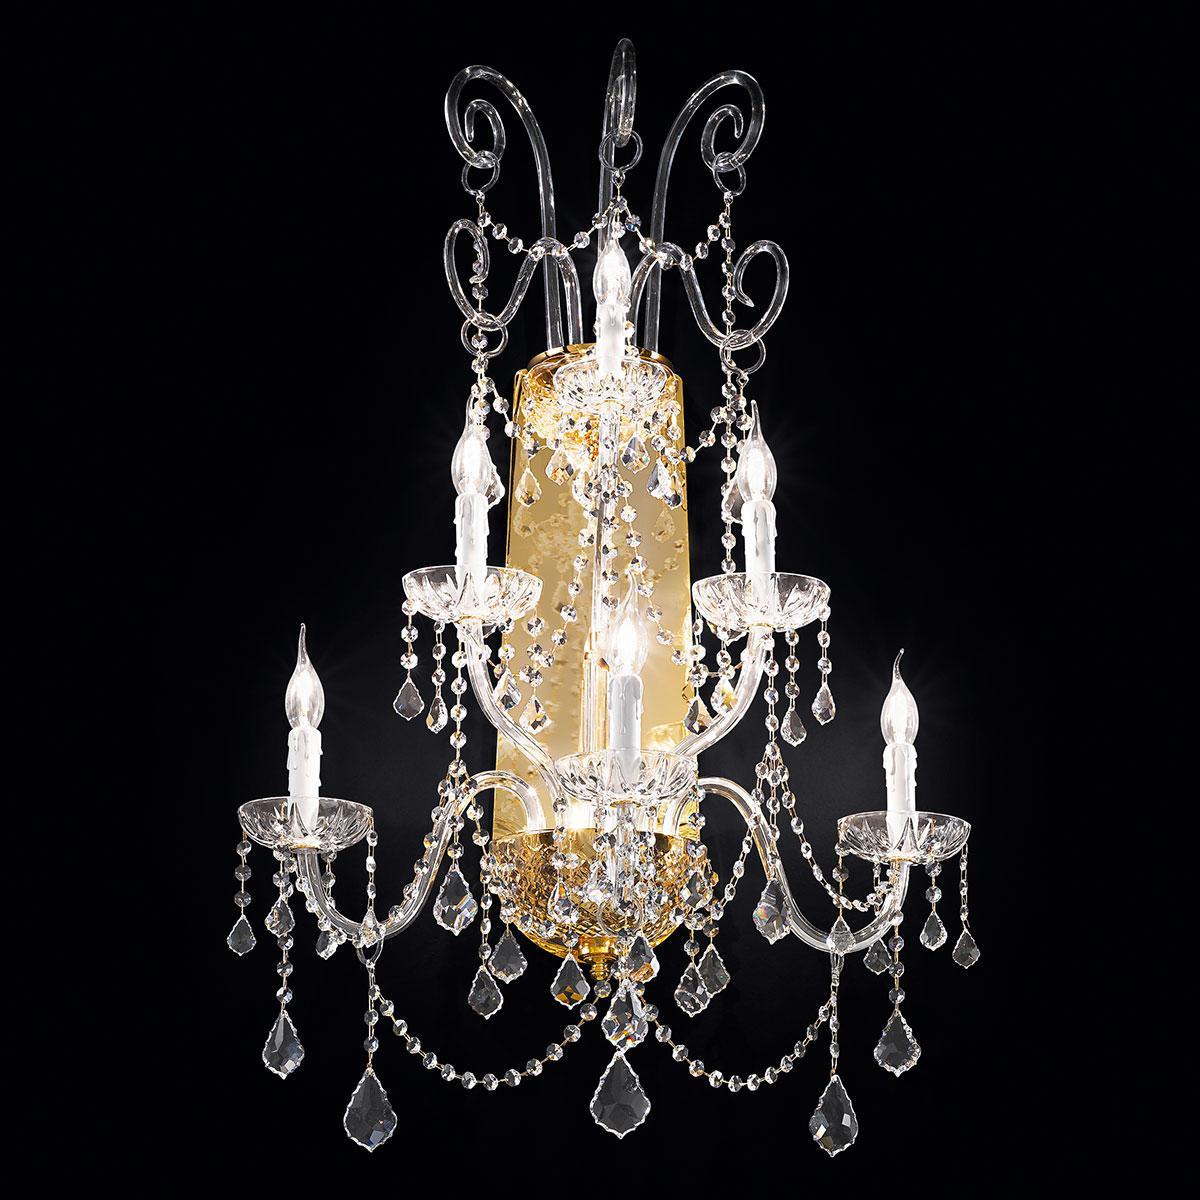 """Veronese"" venezianischer kristall wandleuchte - 3+2+1 flammig - transparent mit kristal Asfour"